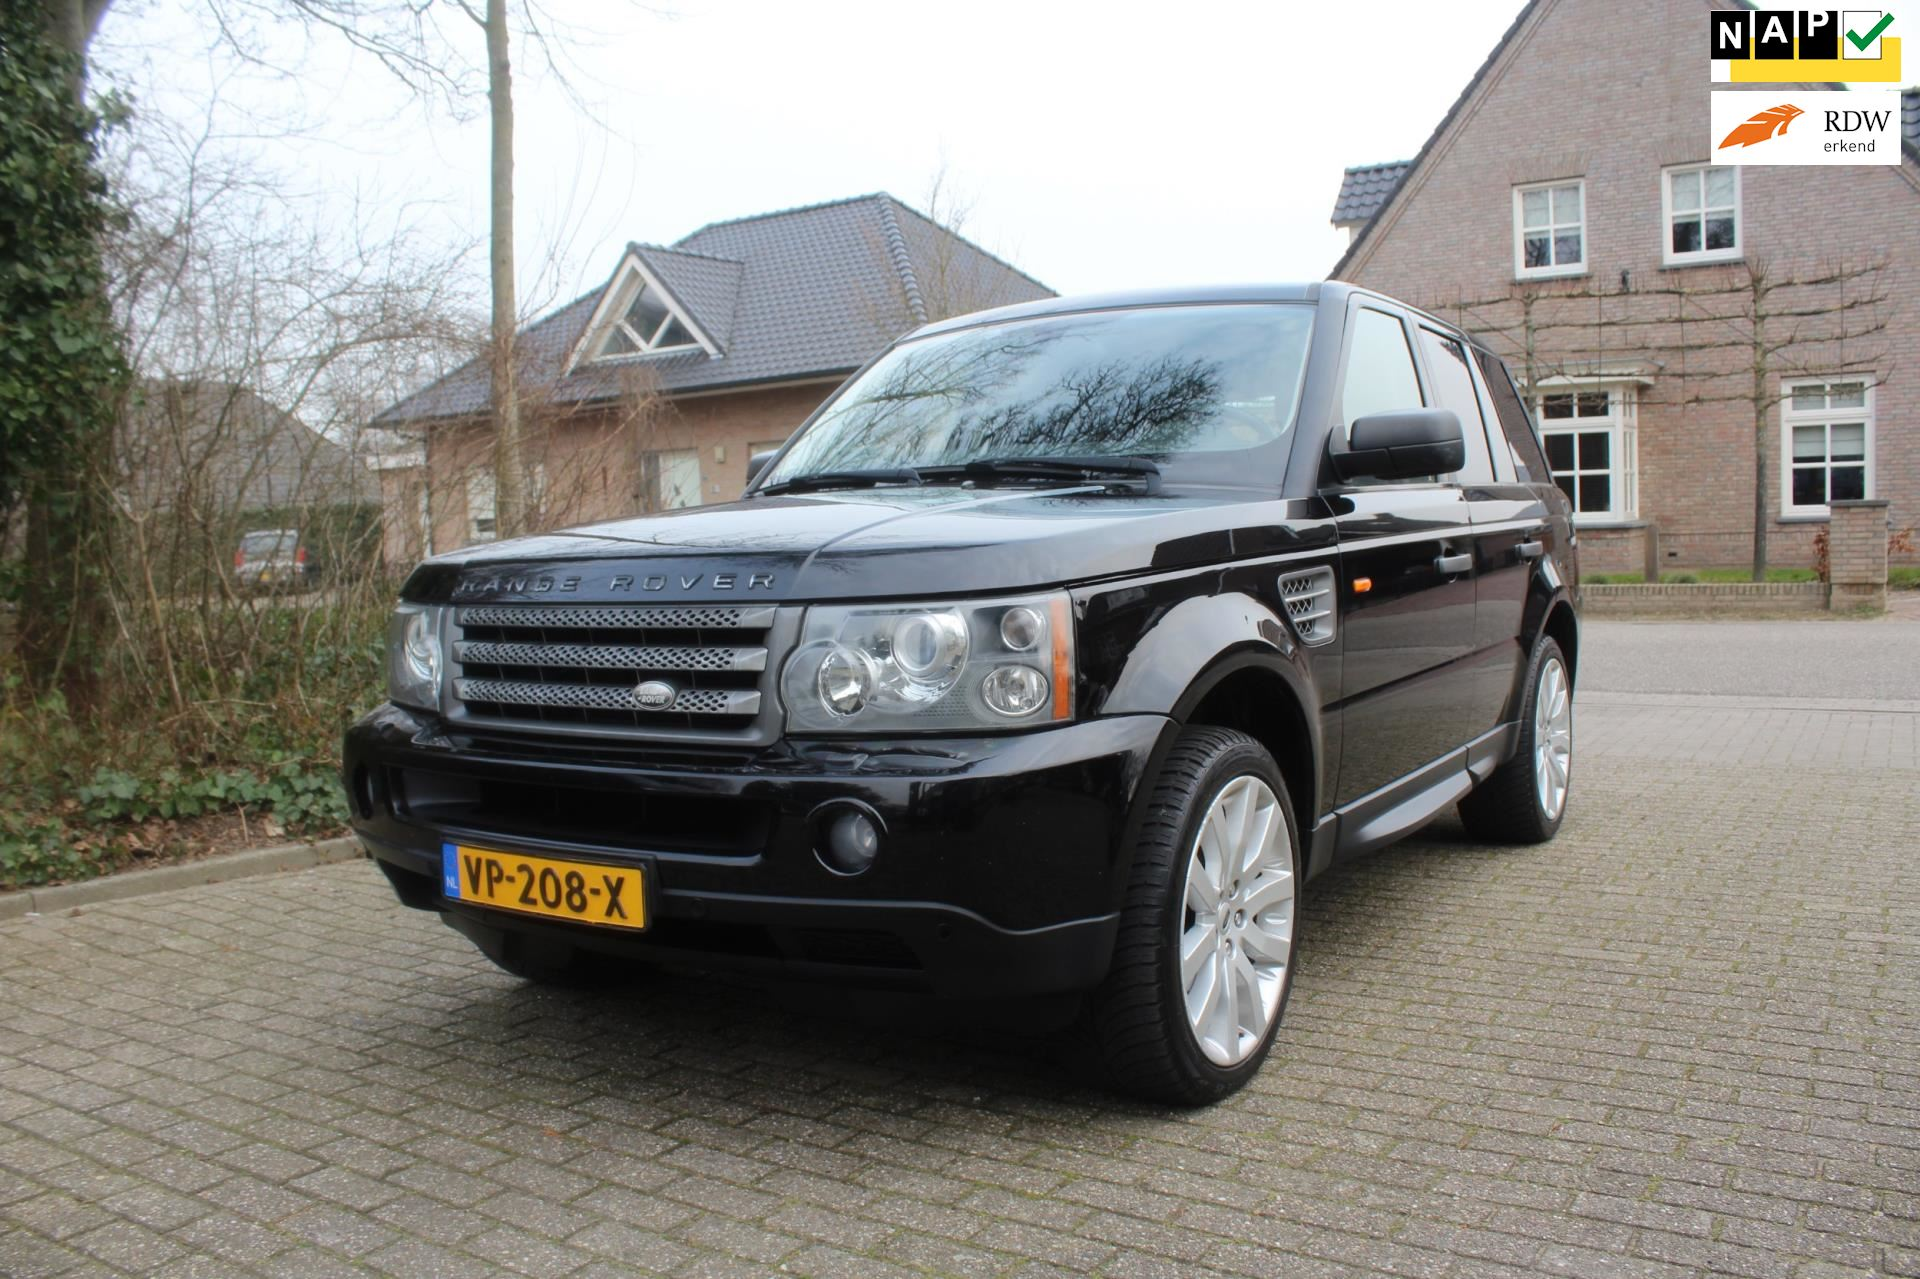 Land Rover RANGE ROVER SPORT occasion - Autogroothandel Ammerzoden